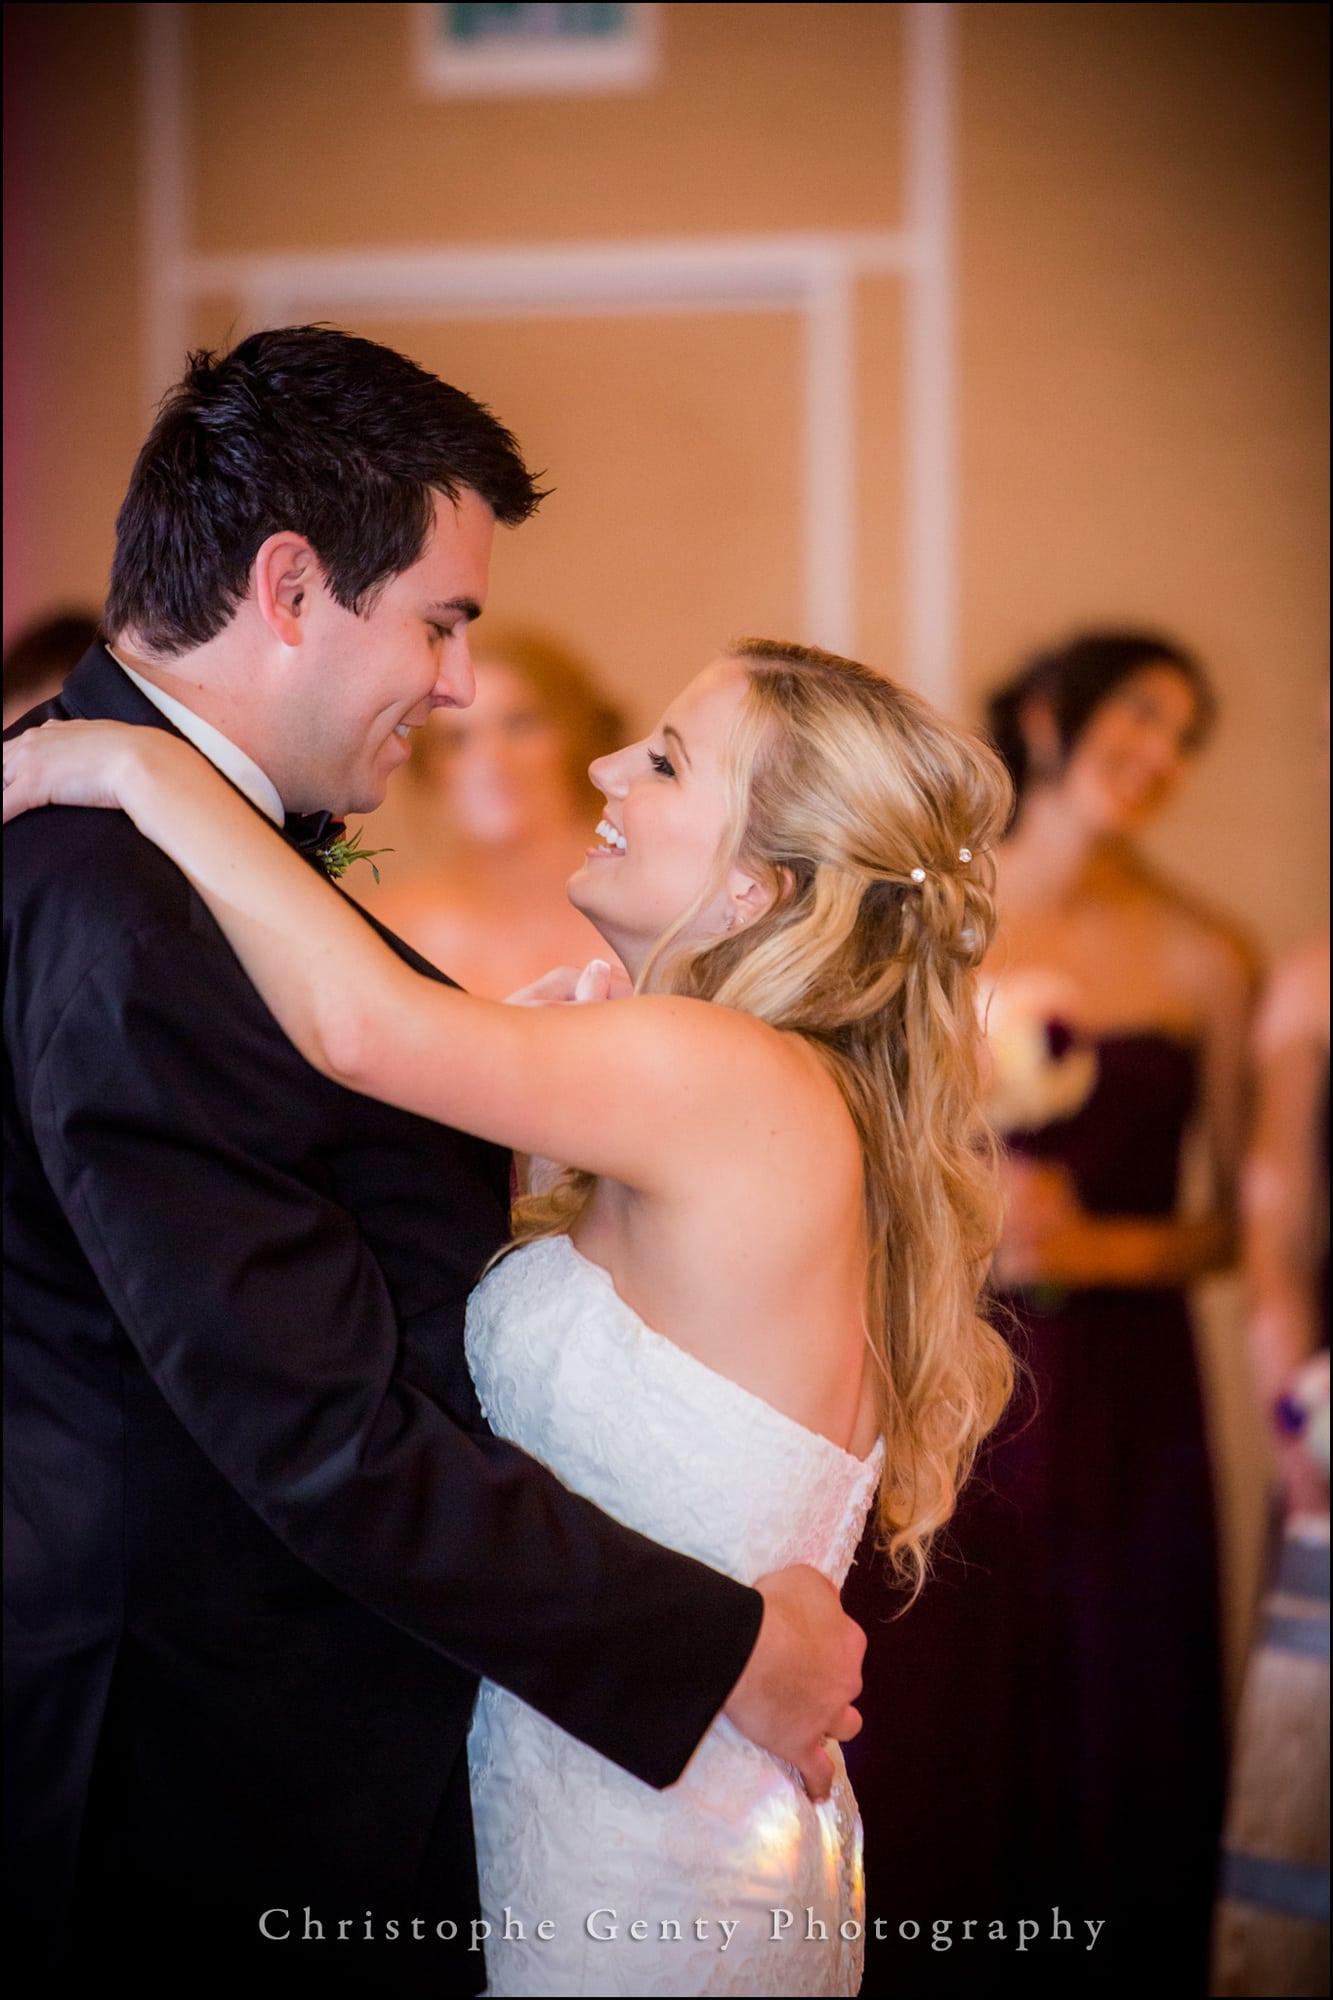 Wedding Photography at The Meritage Inn & Spa, Napa CA - Jennifer & Pribin